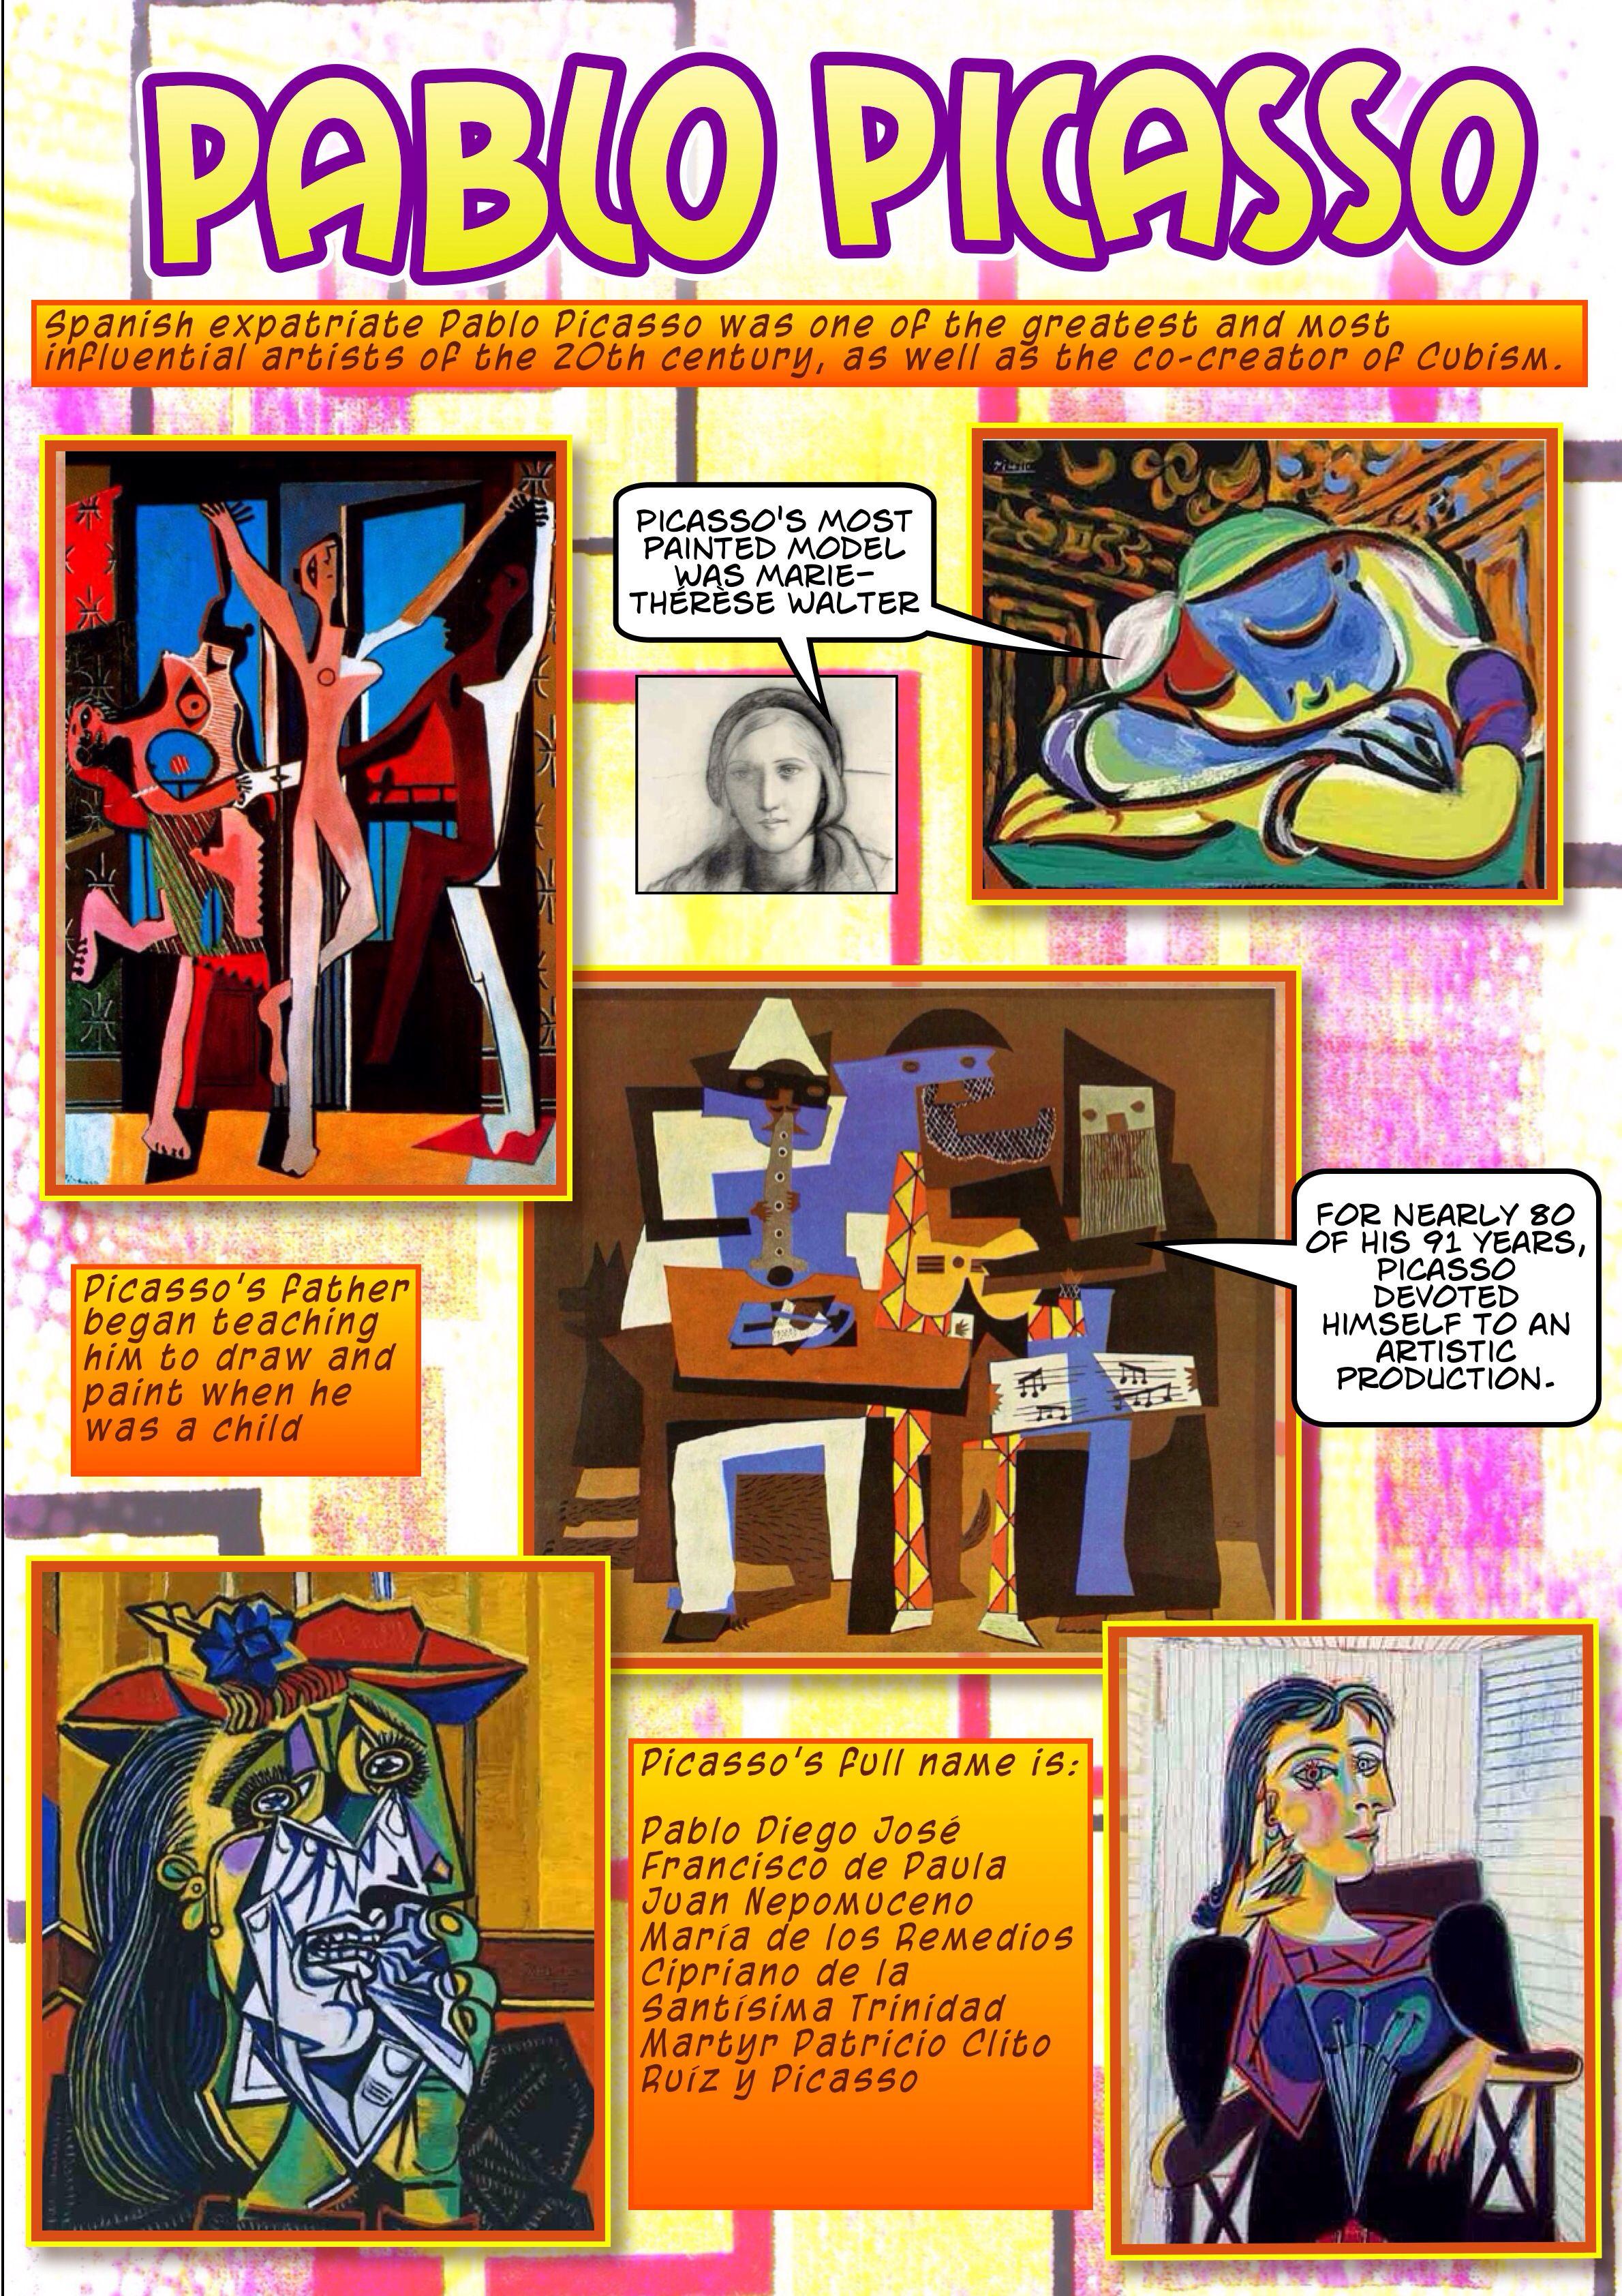 Pablo Picasso Artist Info Poster